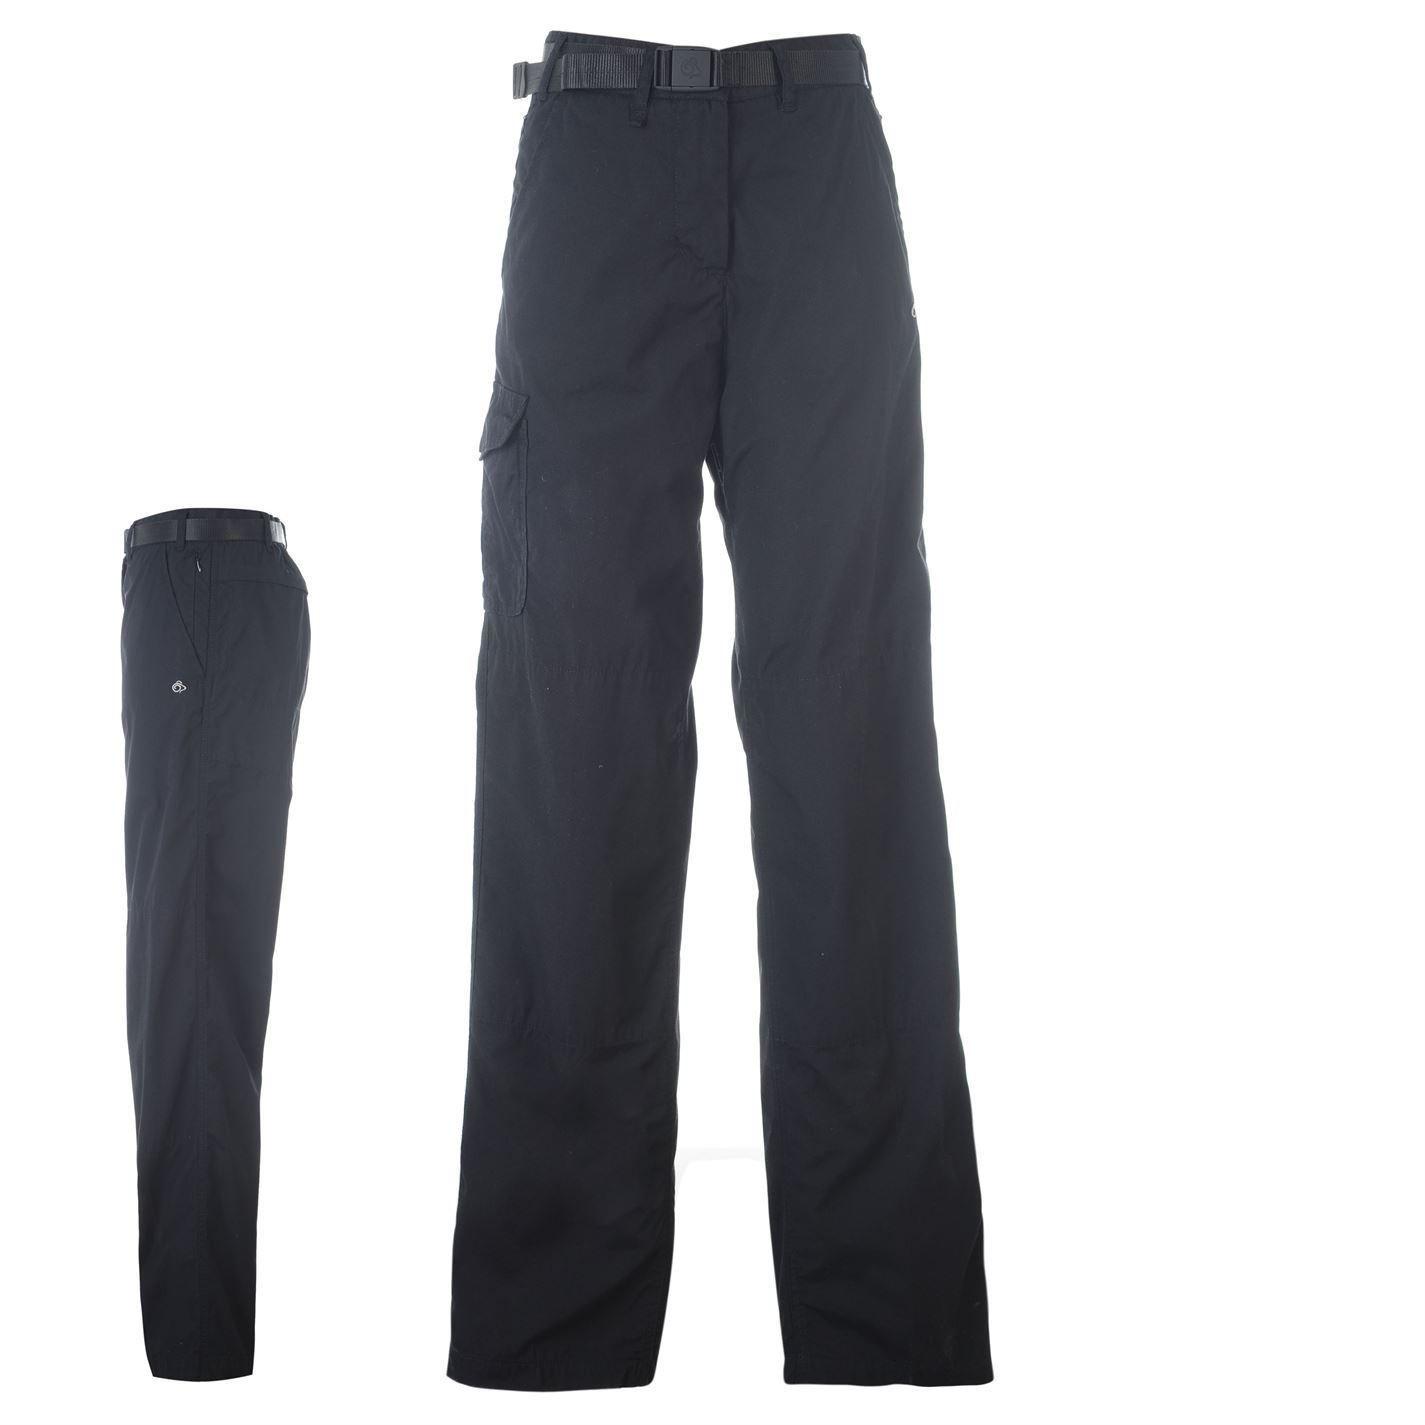 Craghoppers Womens Kiwi Trousers Pants Ladies